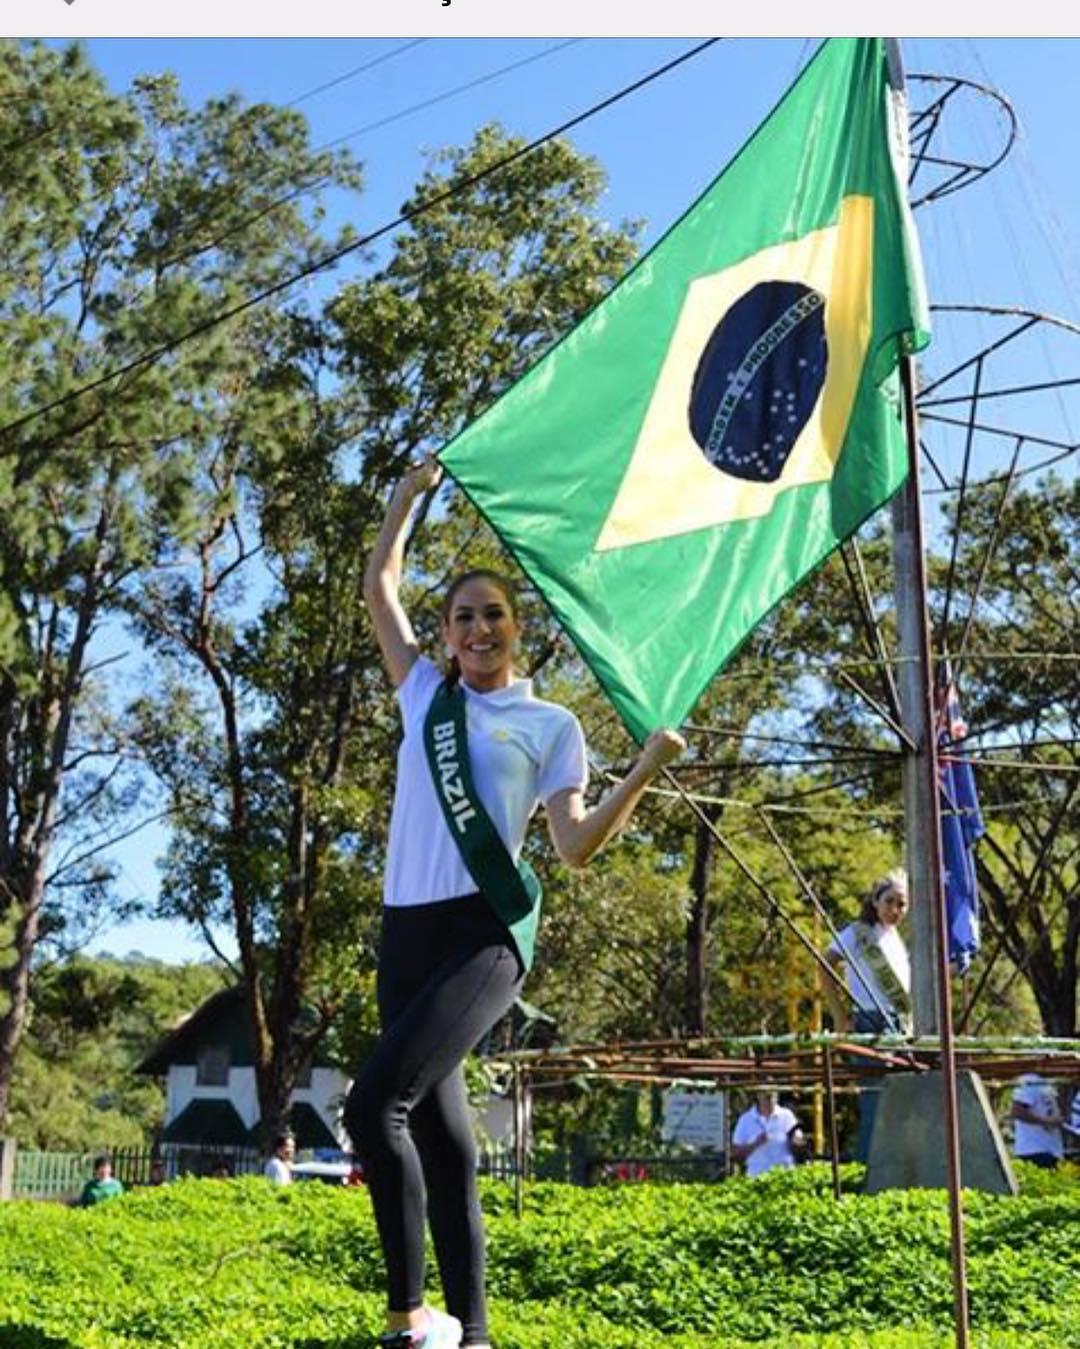 bruna zanardo, 1st runner-up de miss supranational brazil 2020/miss brasil internacional 2017/miss brasil terra 2016. - Página 6 B7kaqgd3